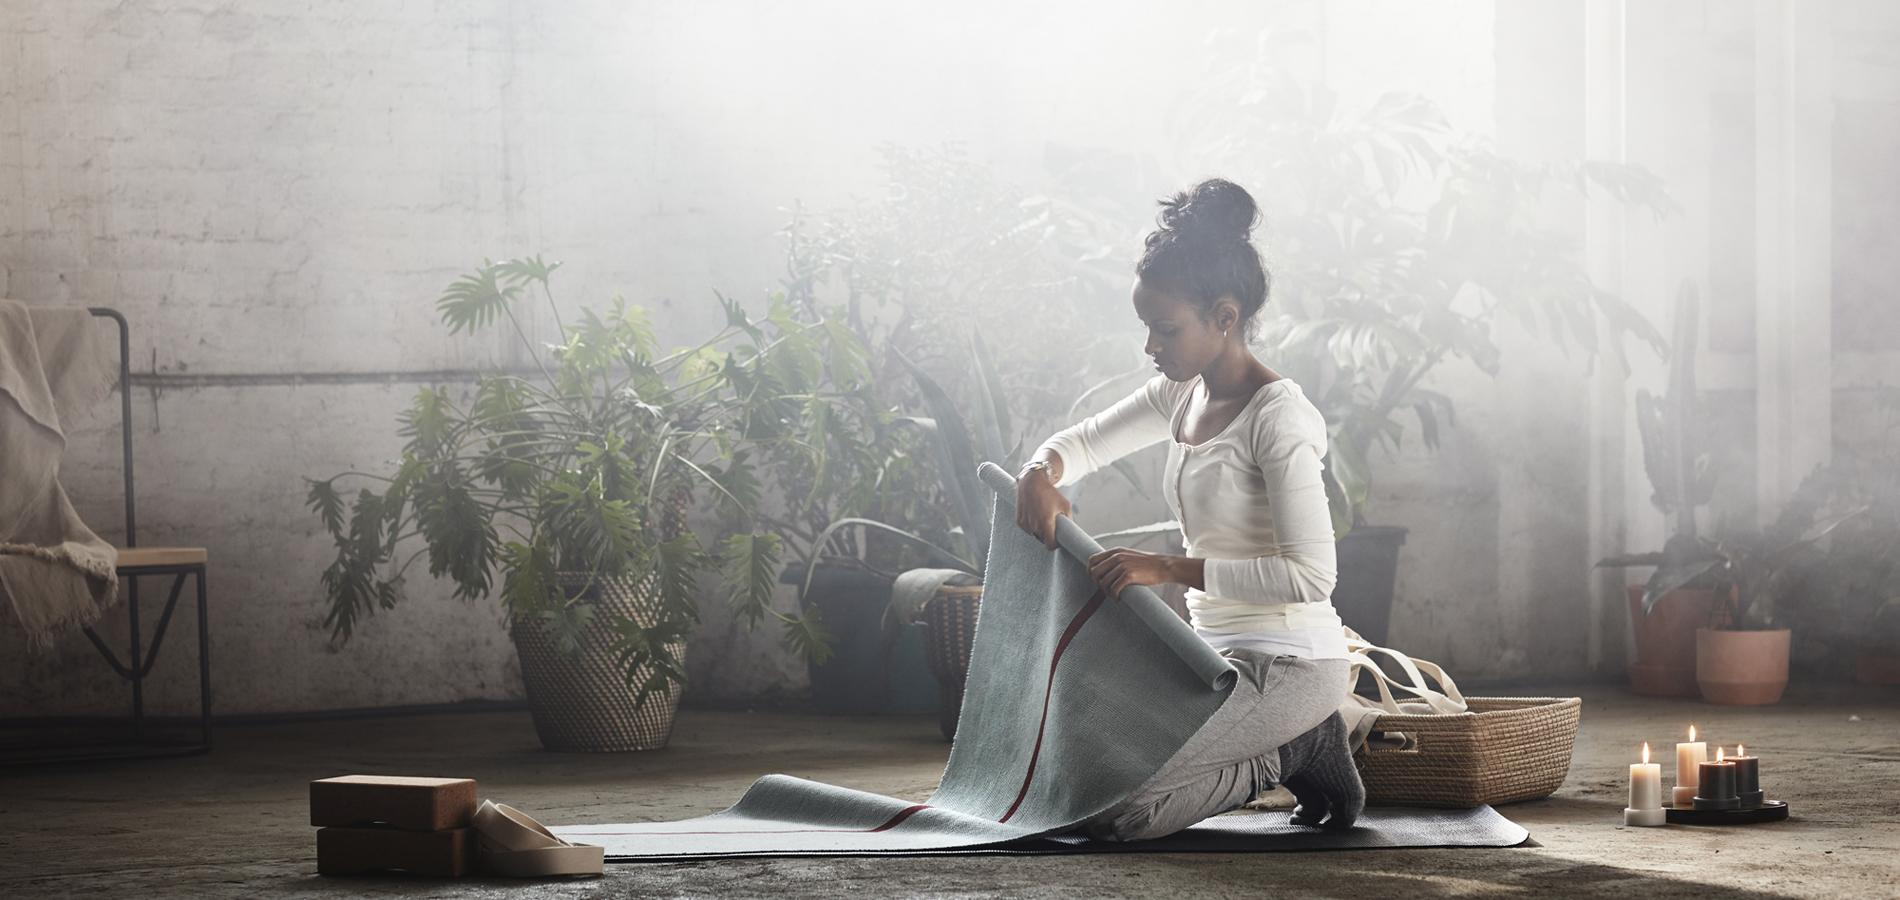 Ikea lance sa premi re collection d di e au yoga madame figaro - Ikea cree sa chambre ...